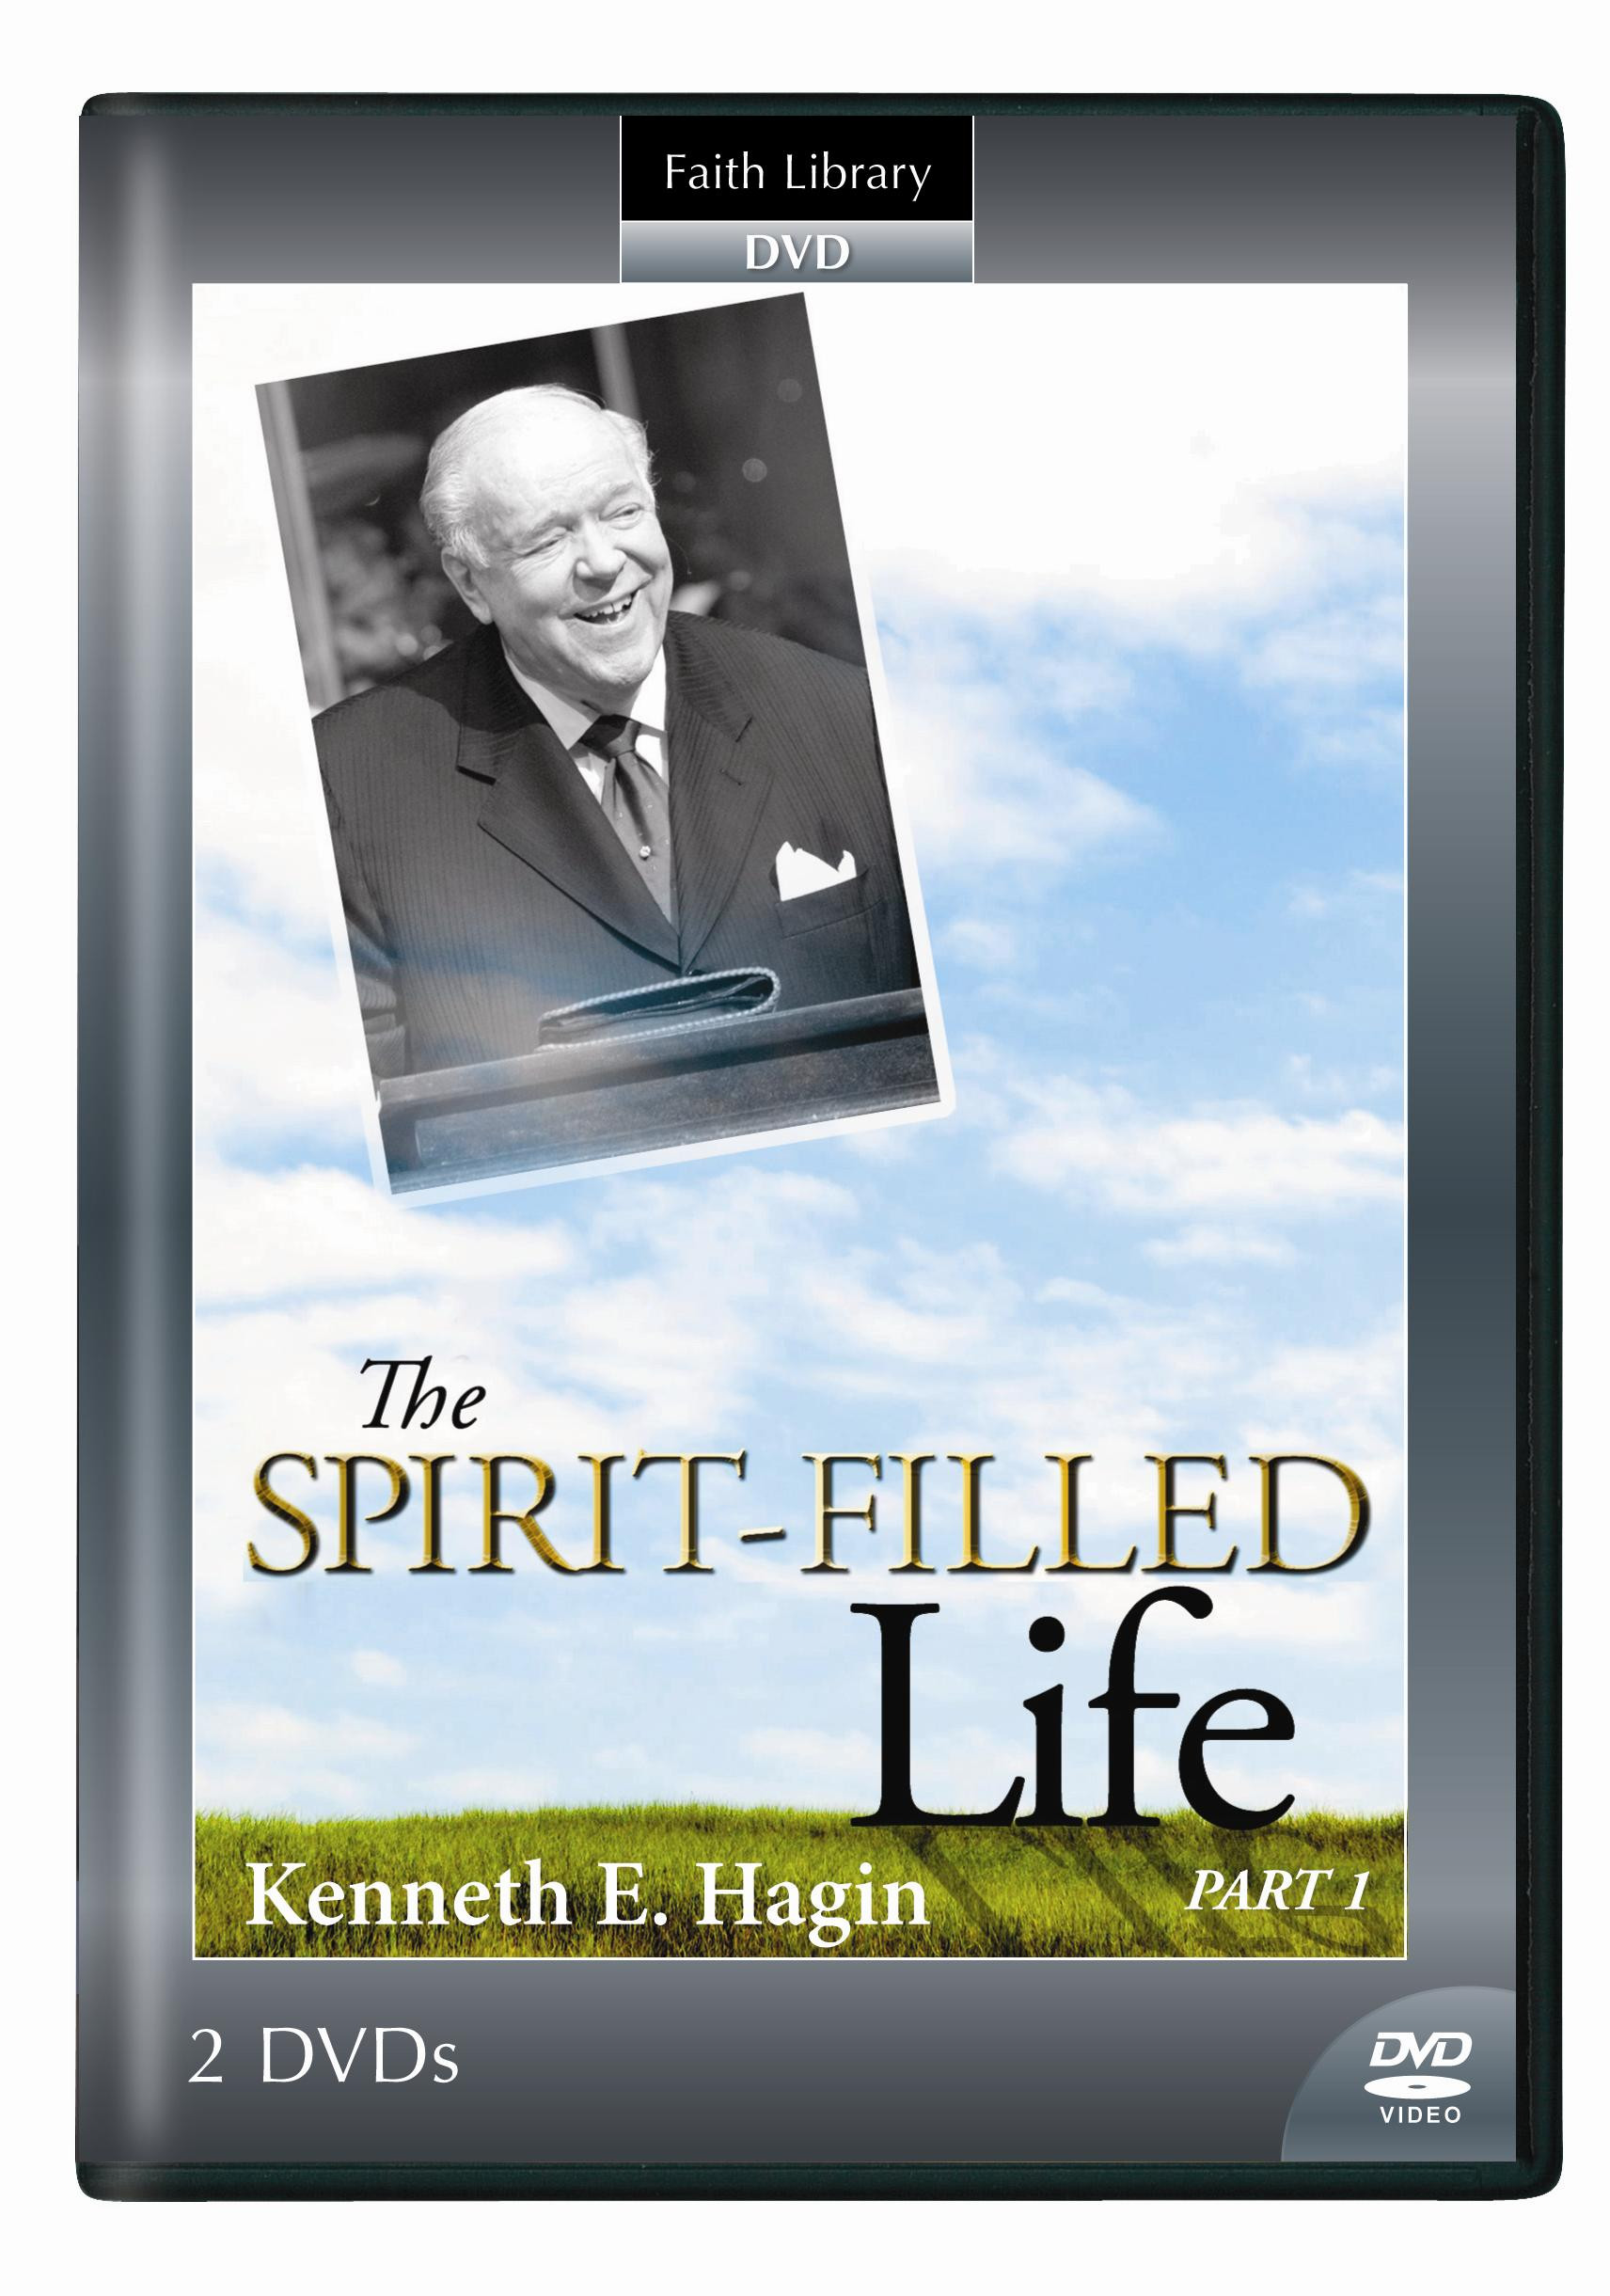 The Spirit-Filled Life - Part 1 (2 DVDs)